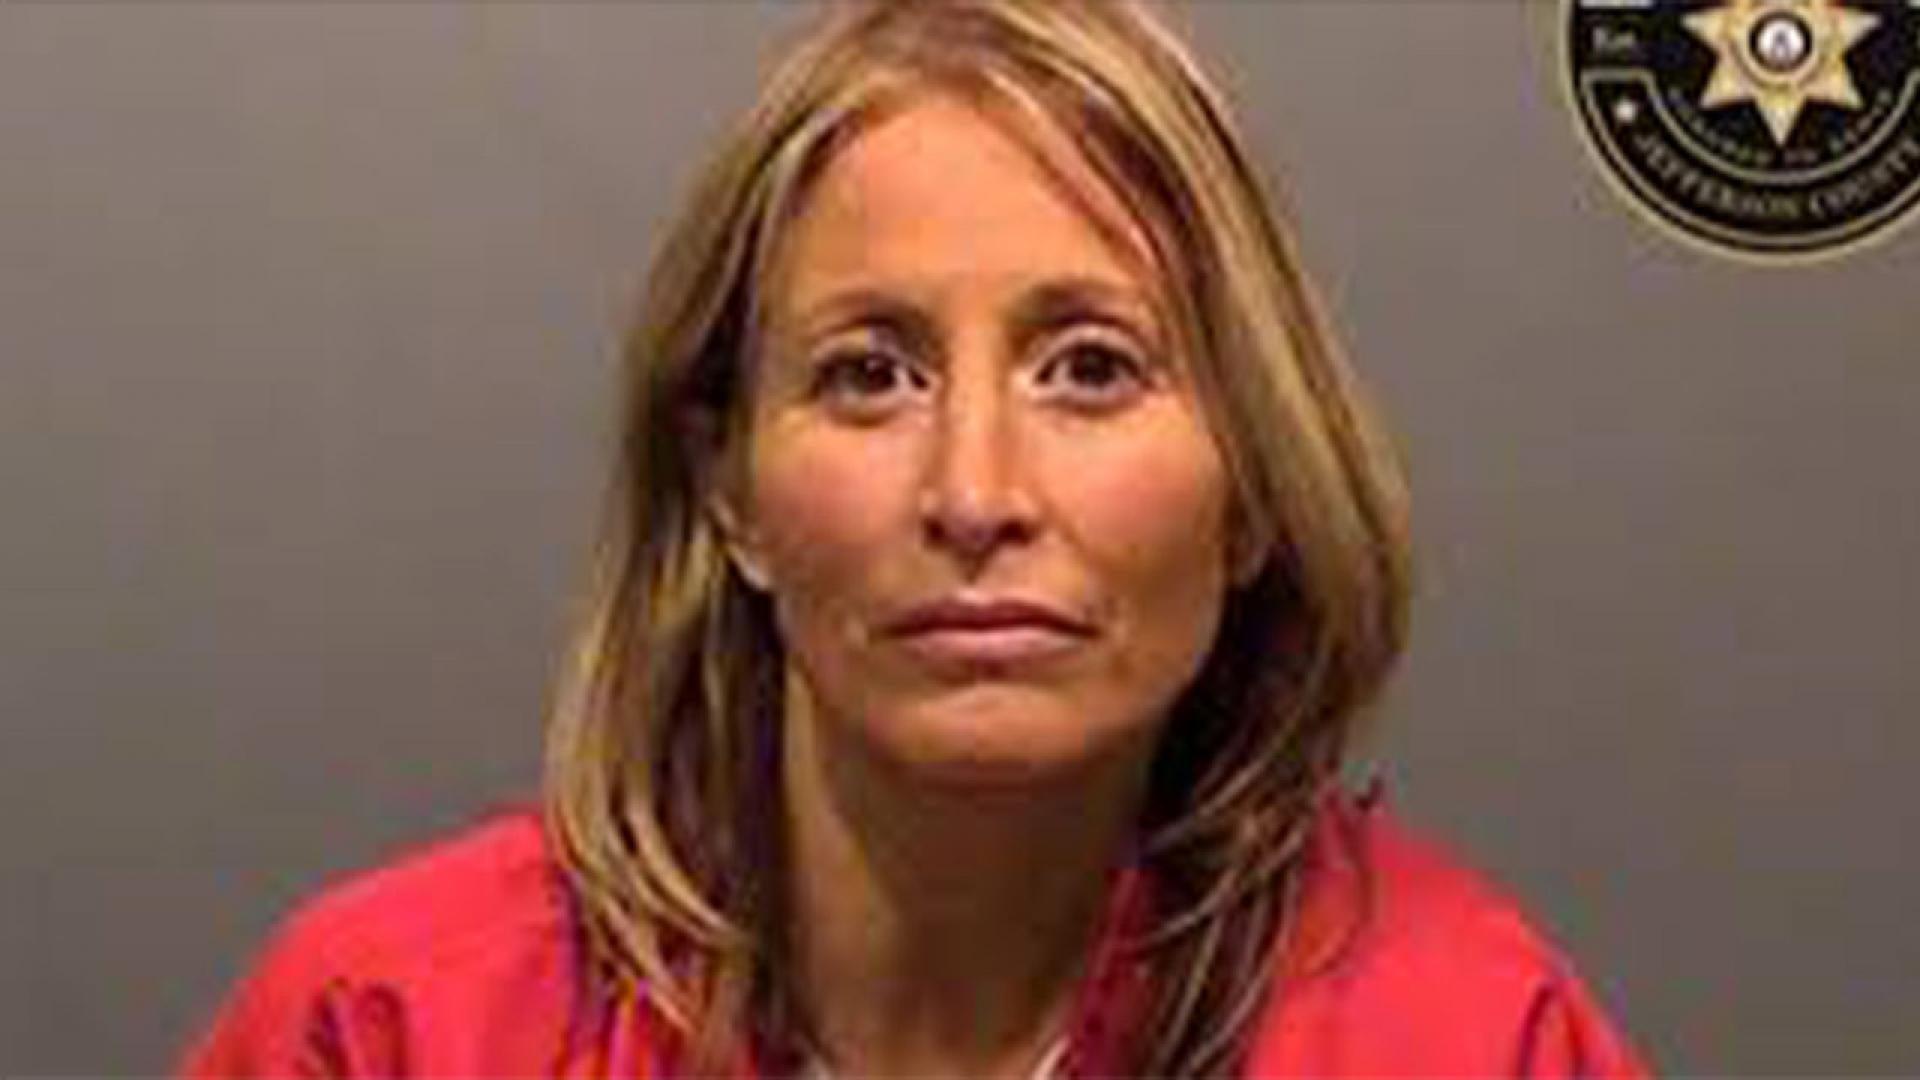 Jennifer Emmi is at the Jefferson County jail